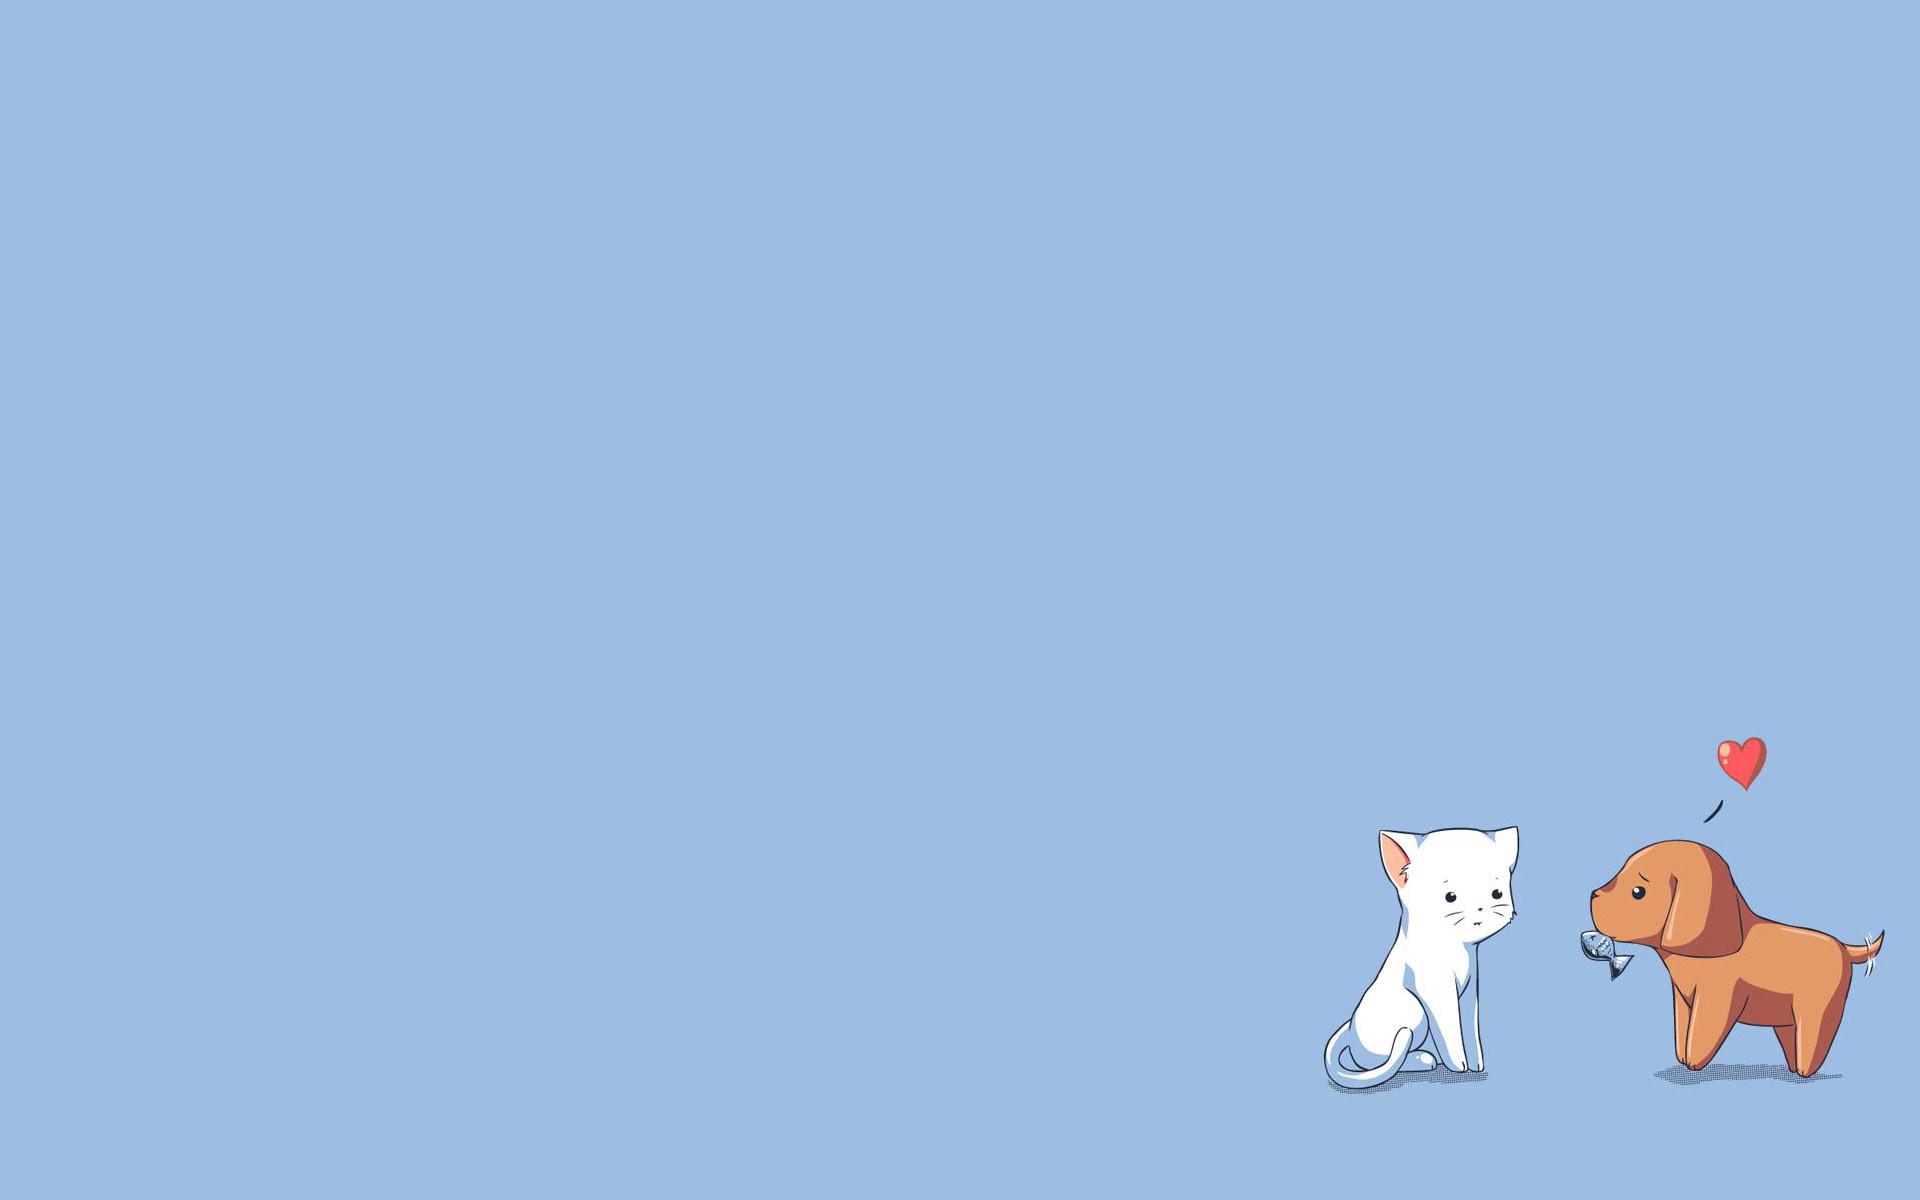 simple cute wallpaper (65+ images)